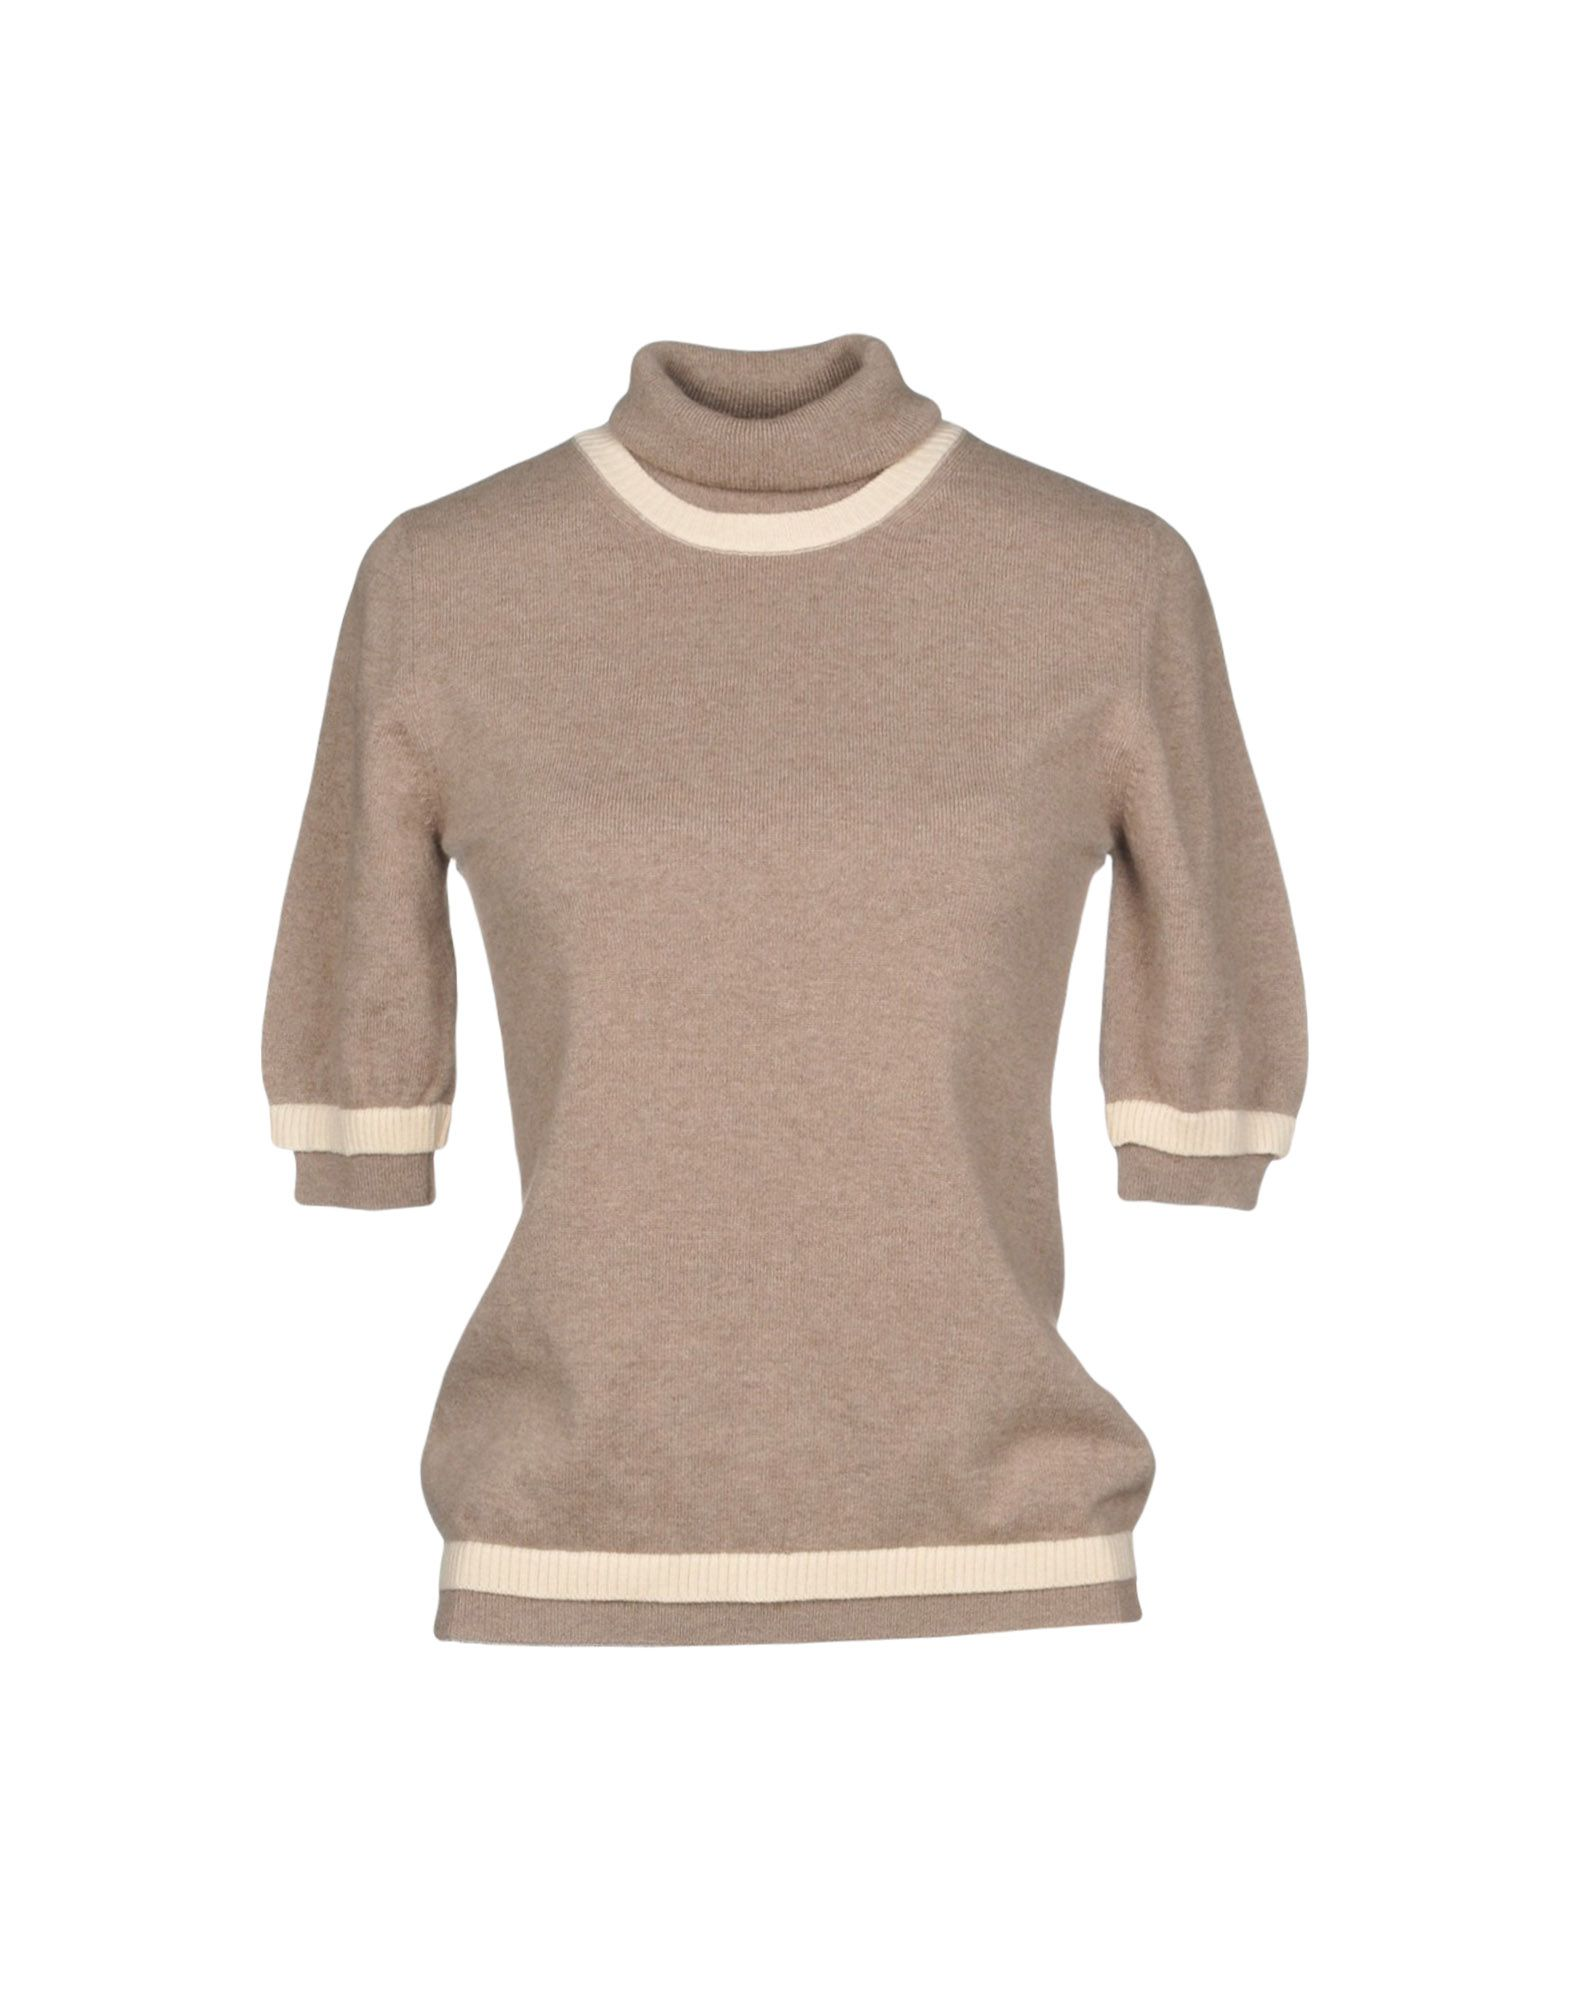 FALDA CASHMERE Водолазки 2015 cintura baixa saia falda